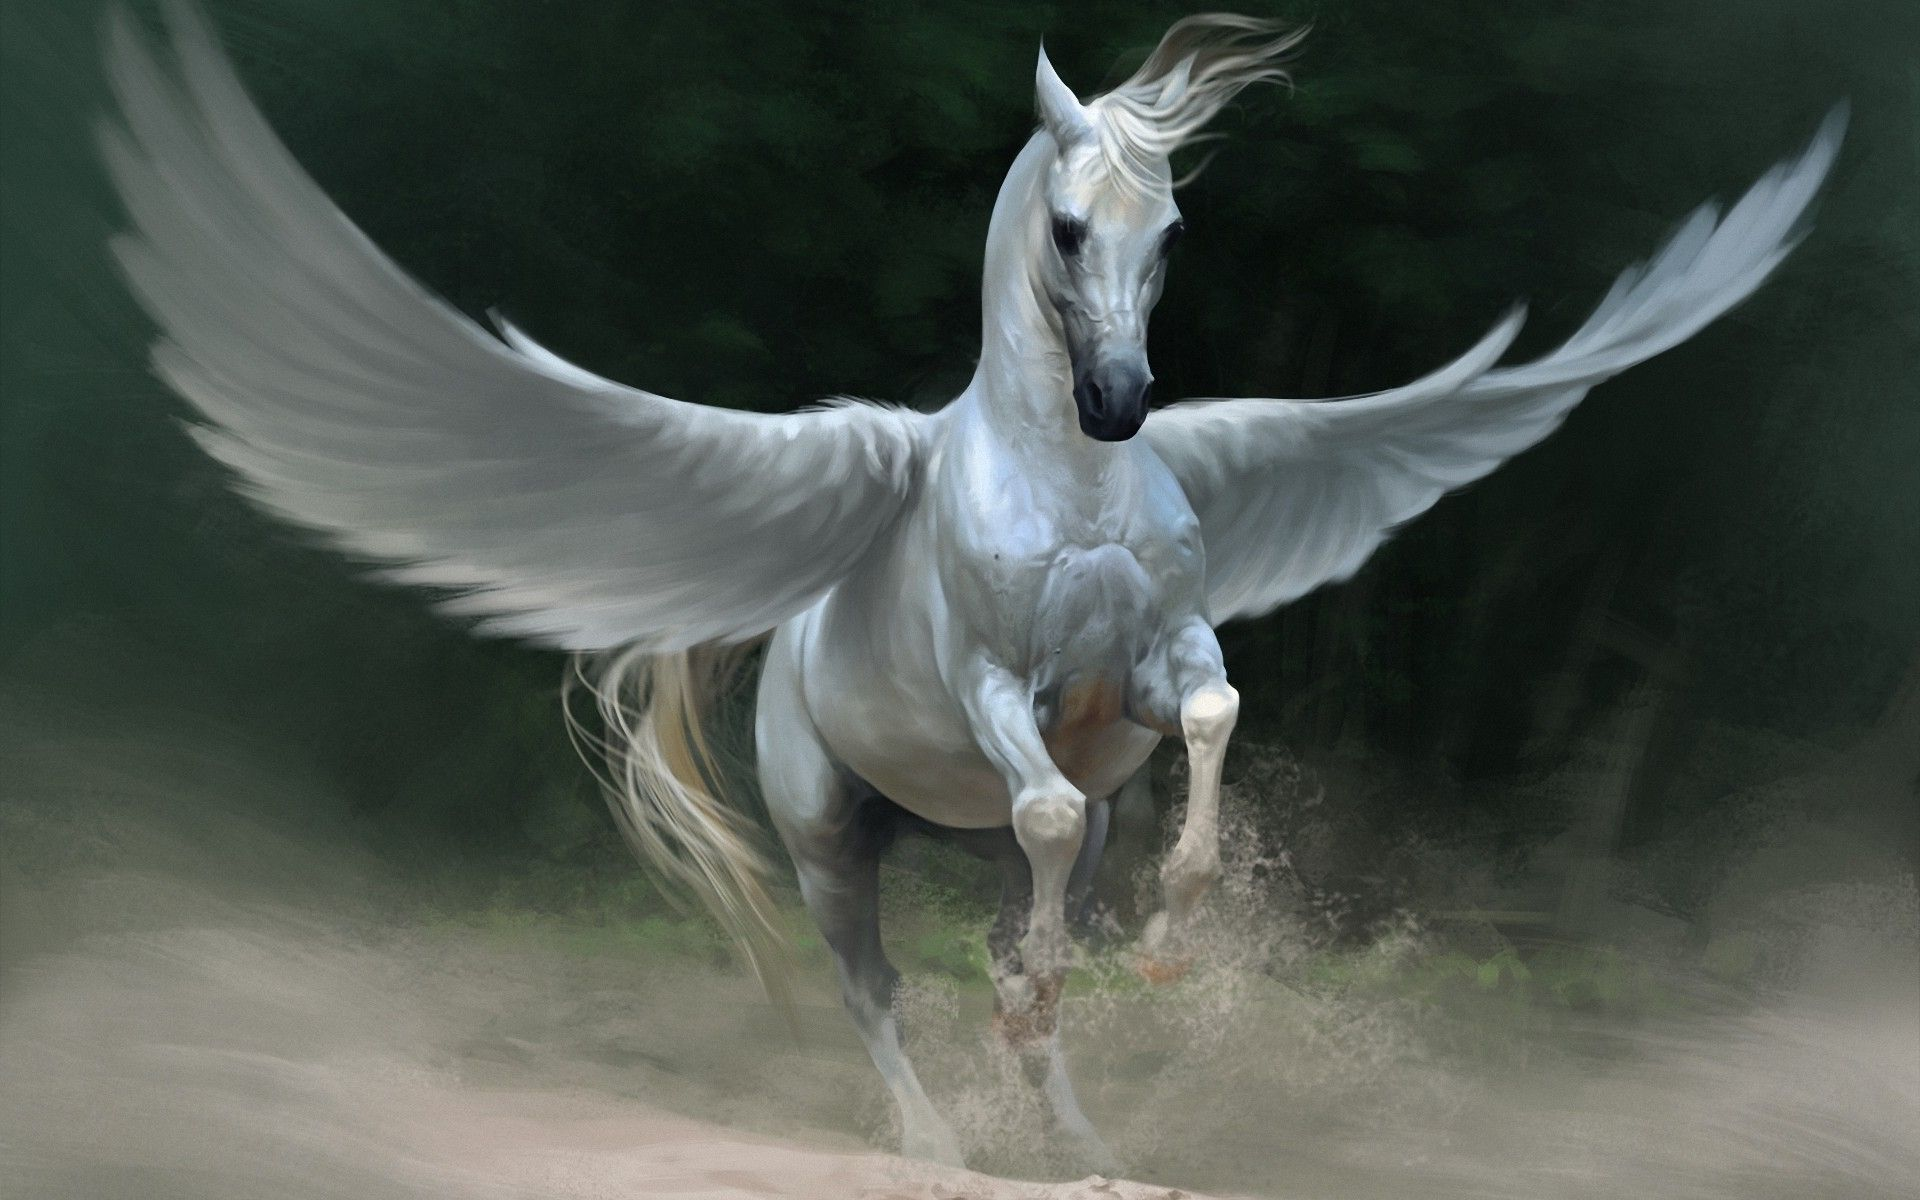 Amazing Wallpaper Horse Magic - b812754e9ea2c04fd89dbcce4c3107d6  Pictures_228511.jpg